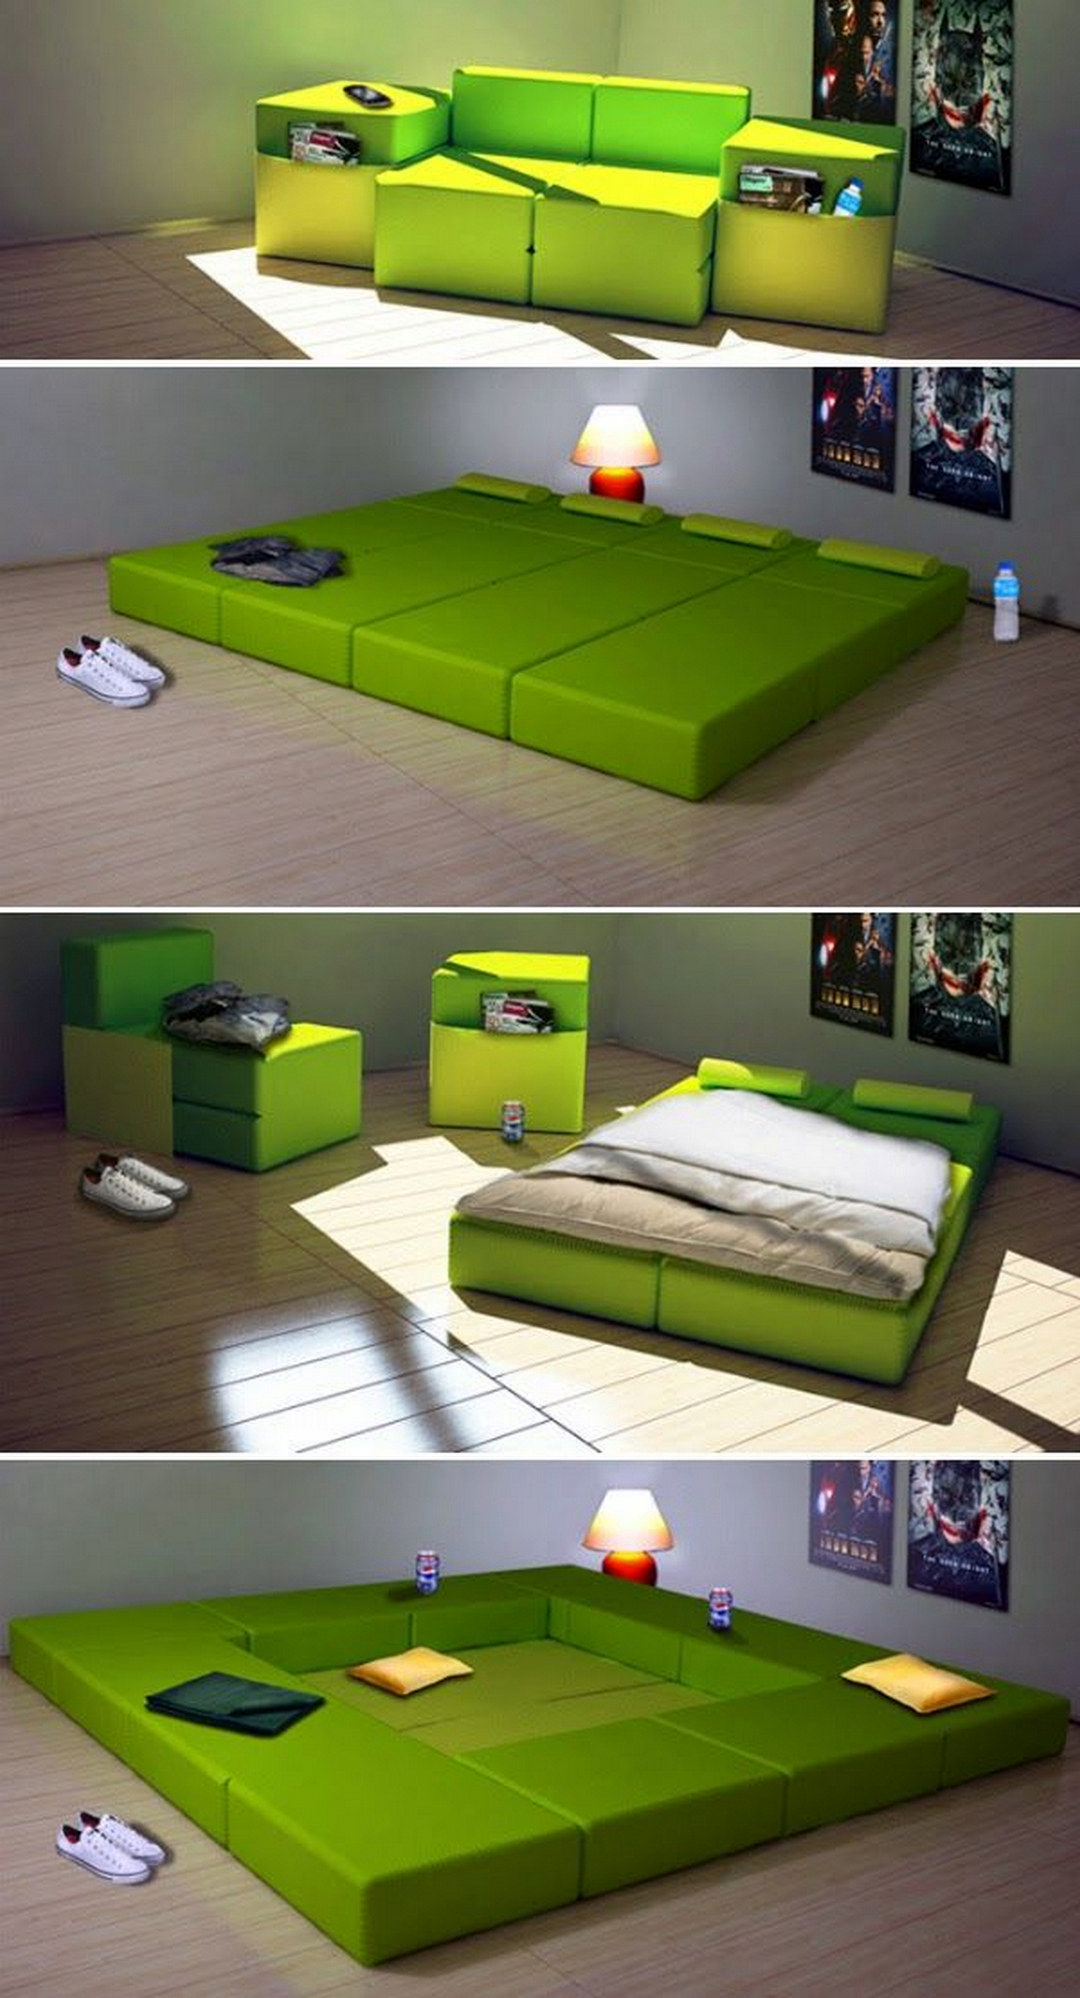 Creative Room Design Ideas: Furniture For The National Audiovisual Institute (NInA): A